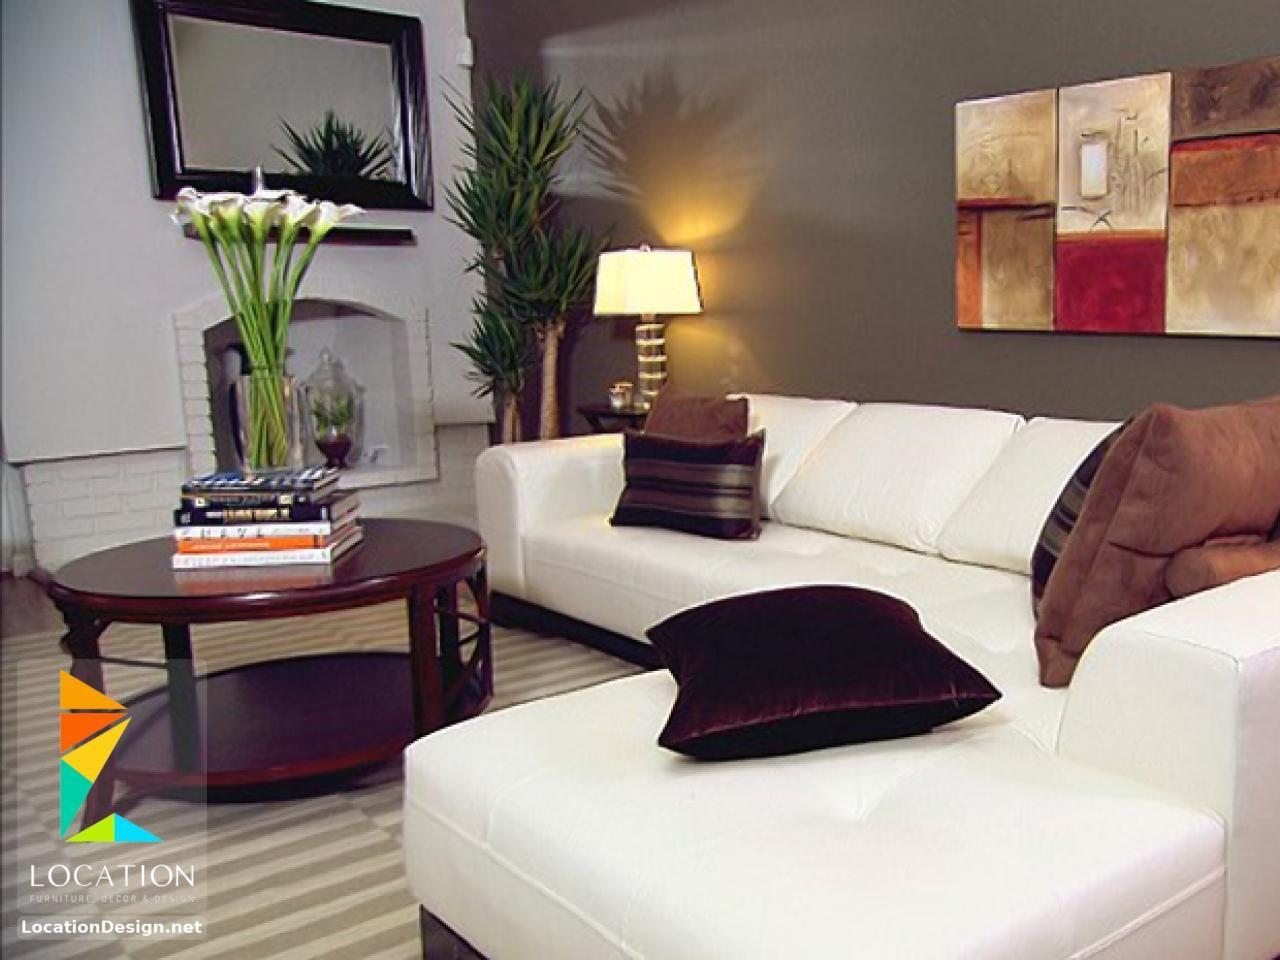 غرف معيشة ديكورات مودرن للصاله 2018 2019 لوكشين ديزين نت Contemporary Decor Living Room Living Room Decor Modern Luxury Living Room